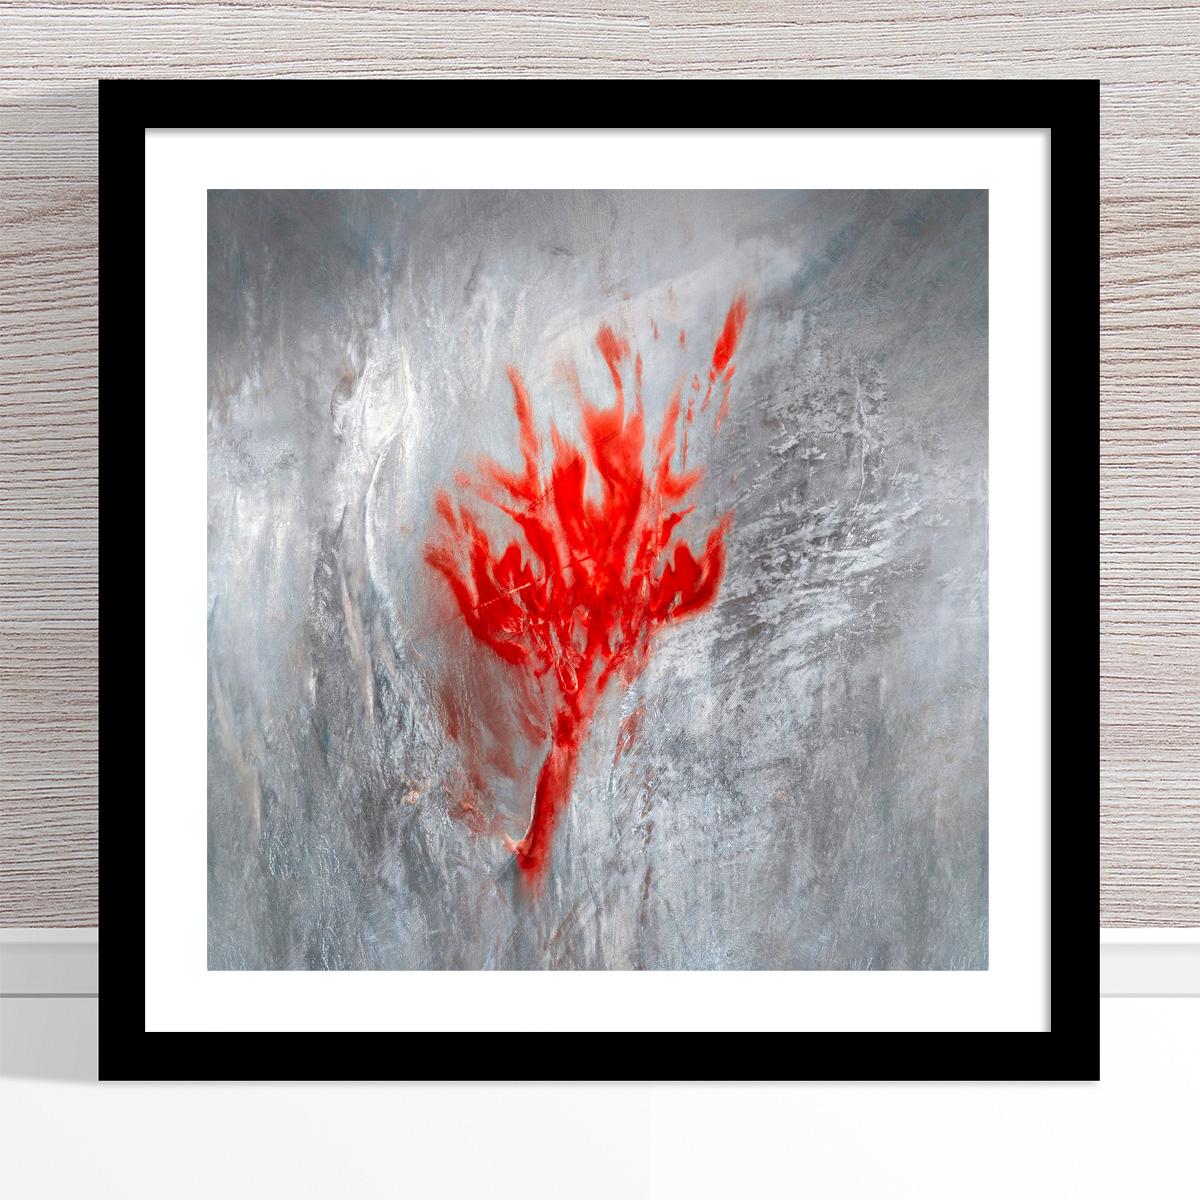 Chris Saunders - 'Aerial Salt 009' Black Frame